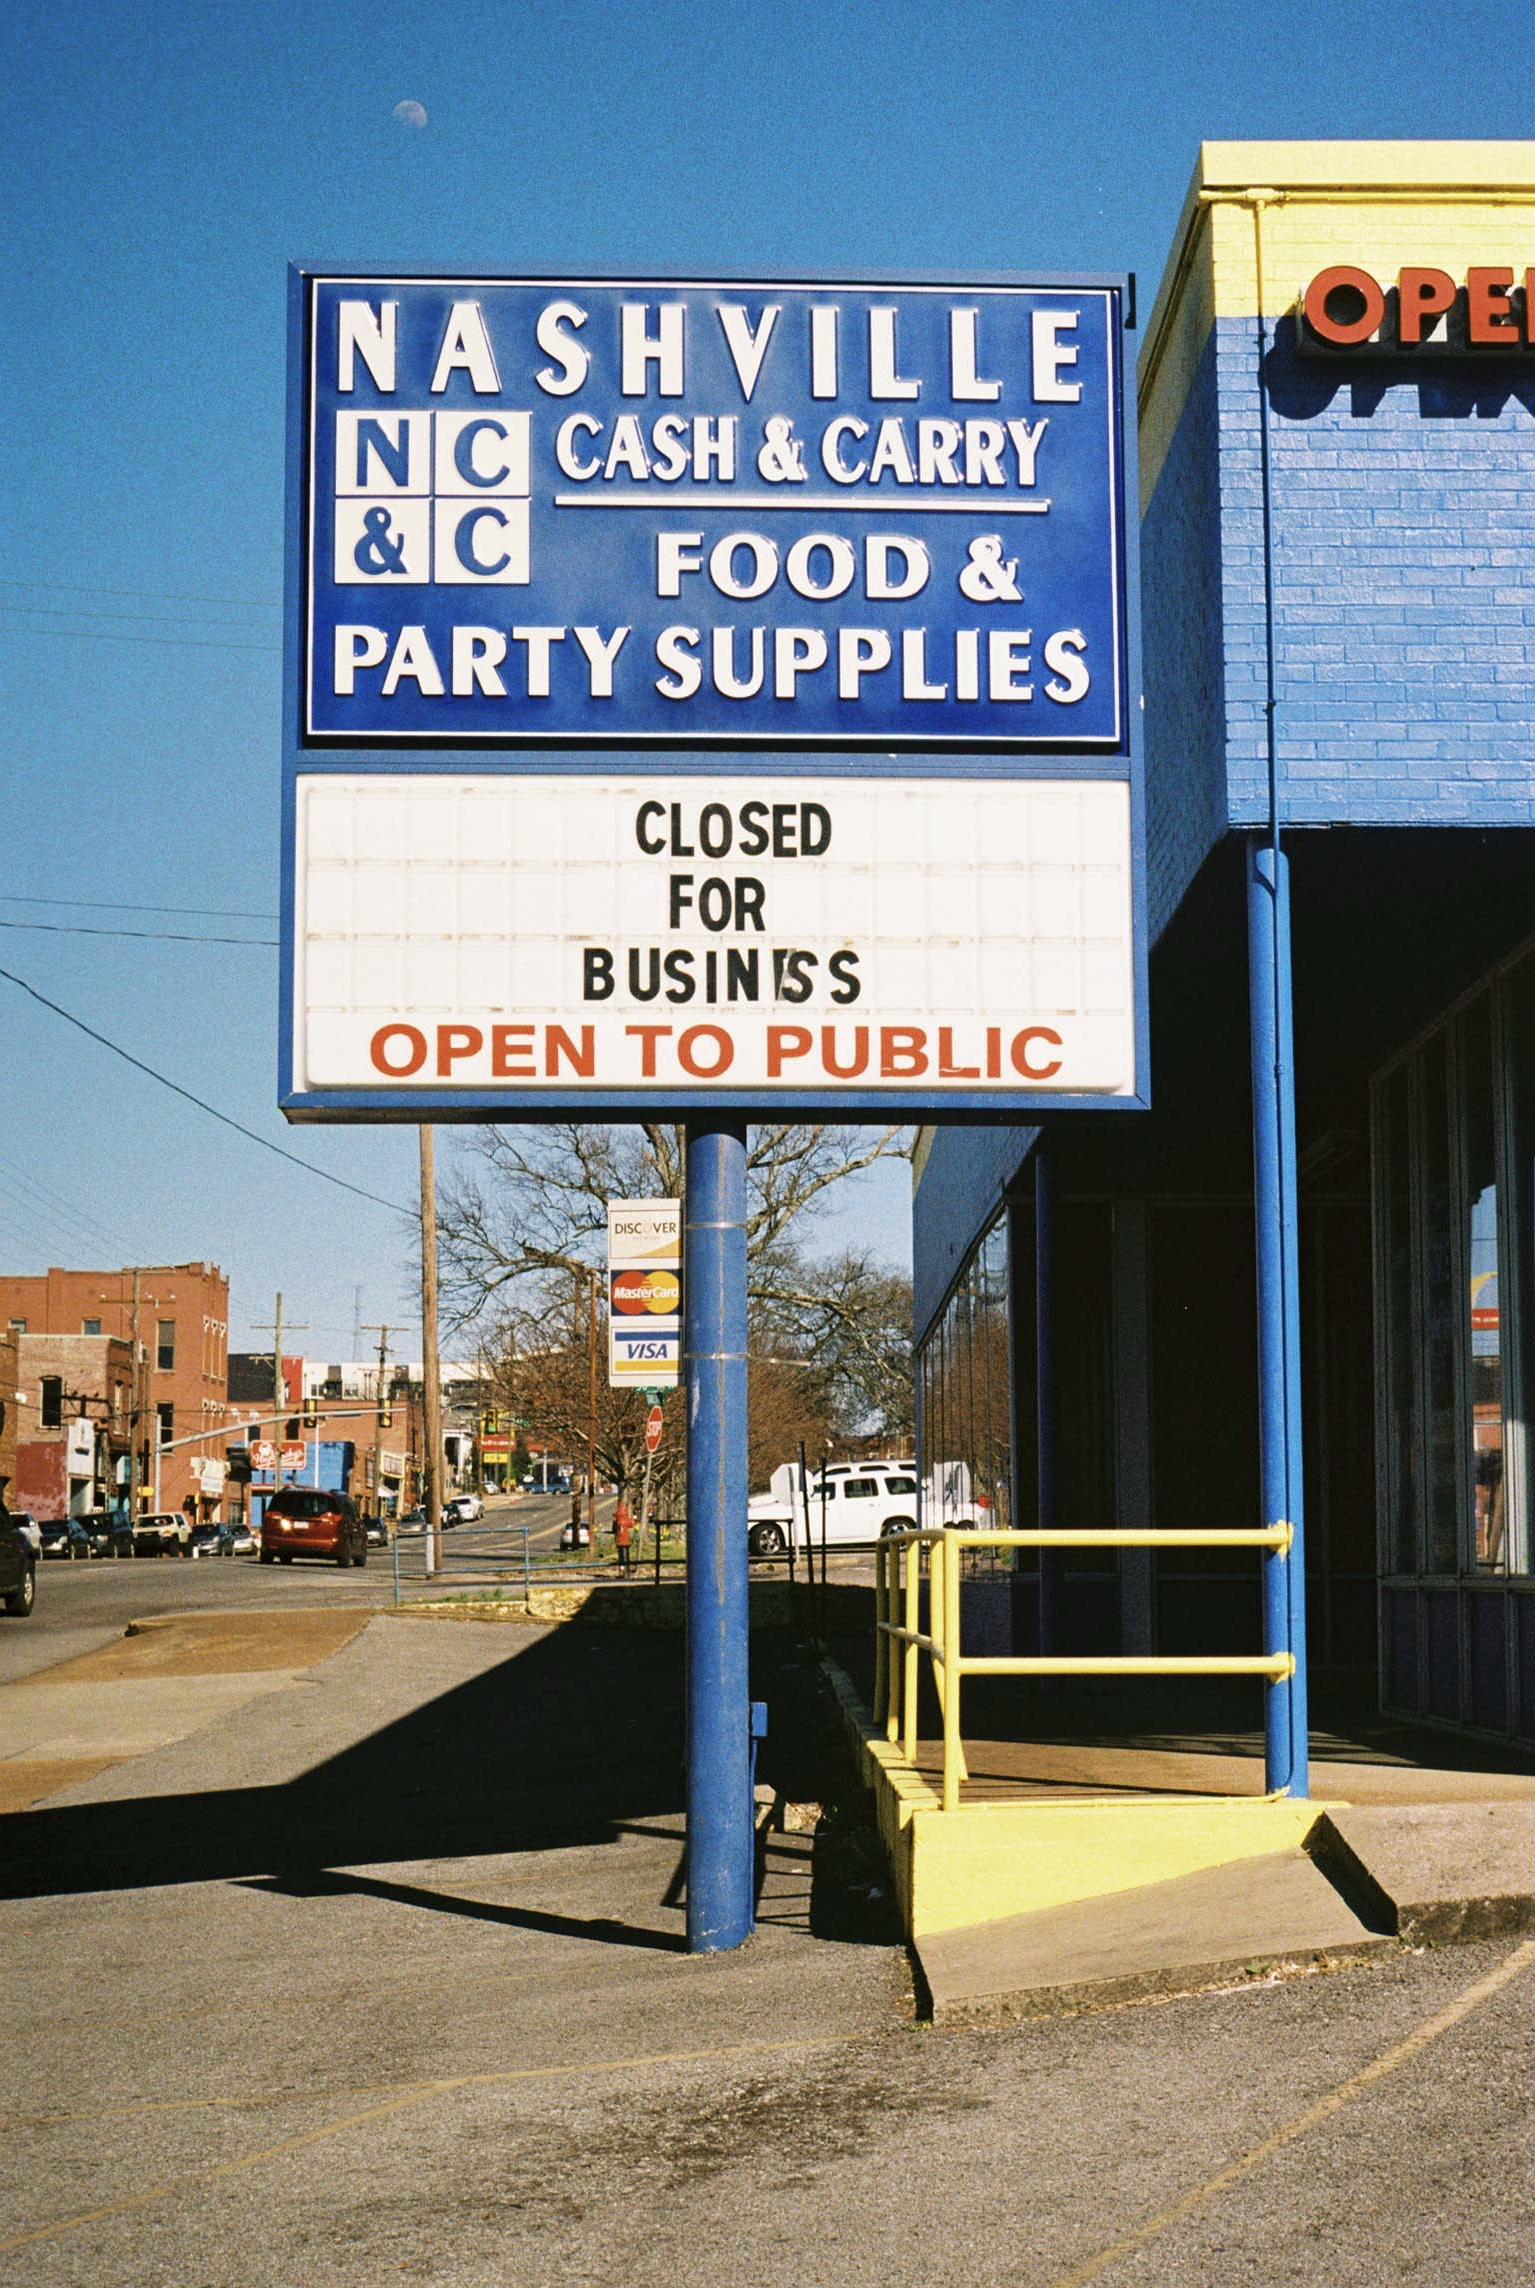 Closed for business but open to the public. Nashville, Tennessee.  Kodak Ultra Max 400. Pentax K1000. Fletcher Berryman 2019.